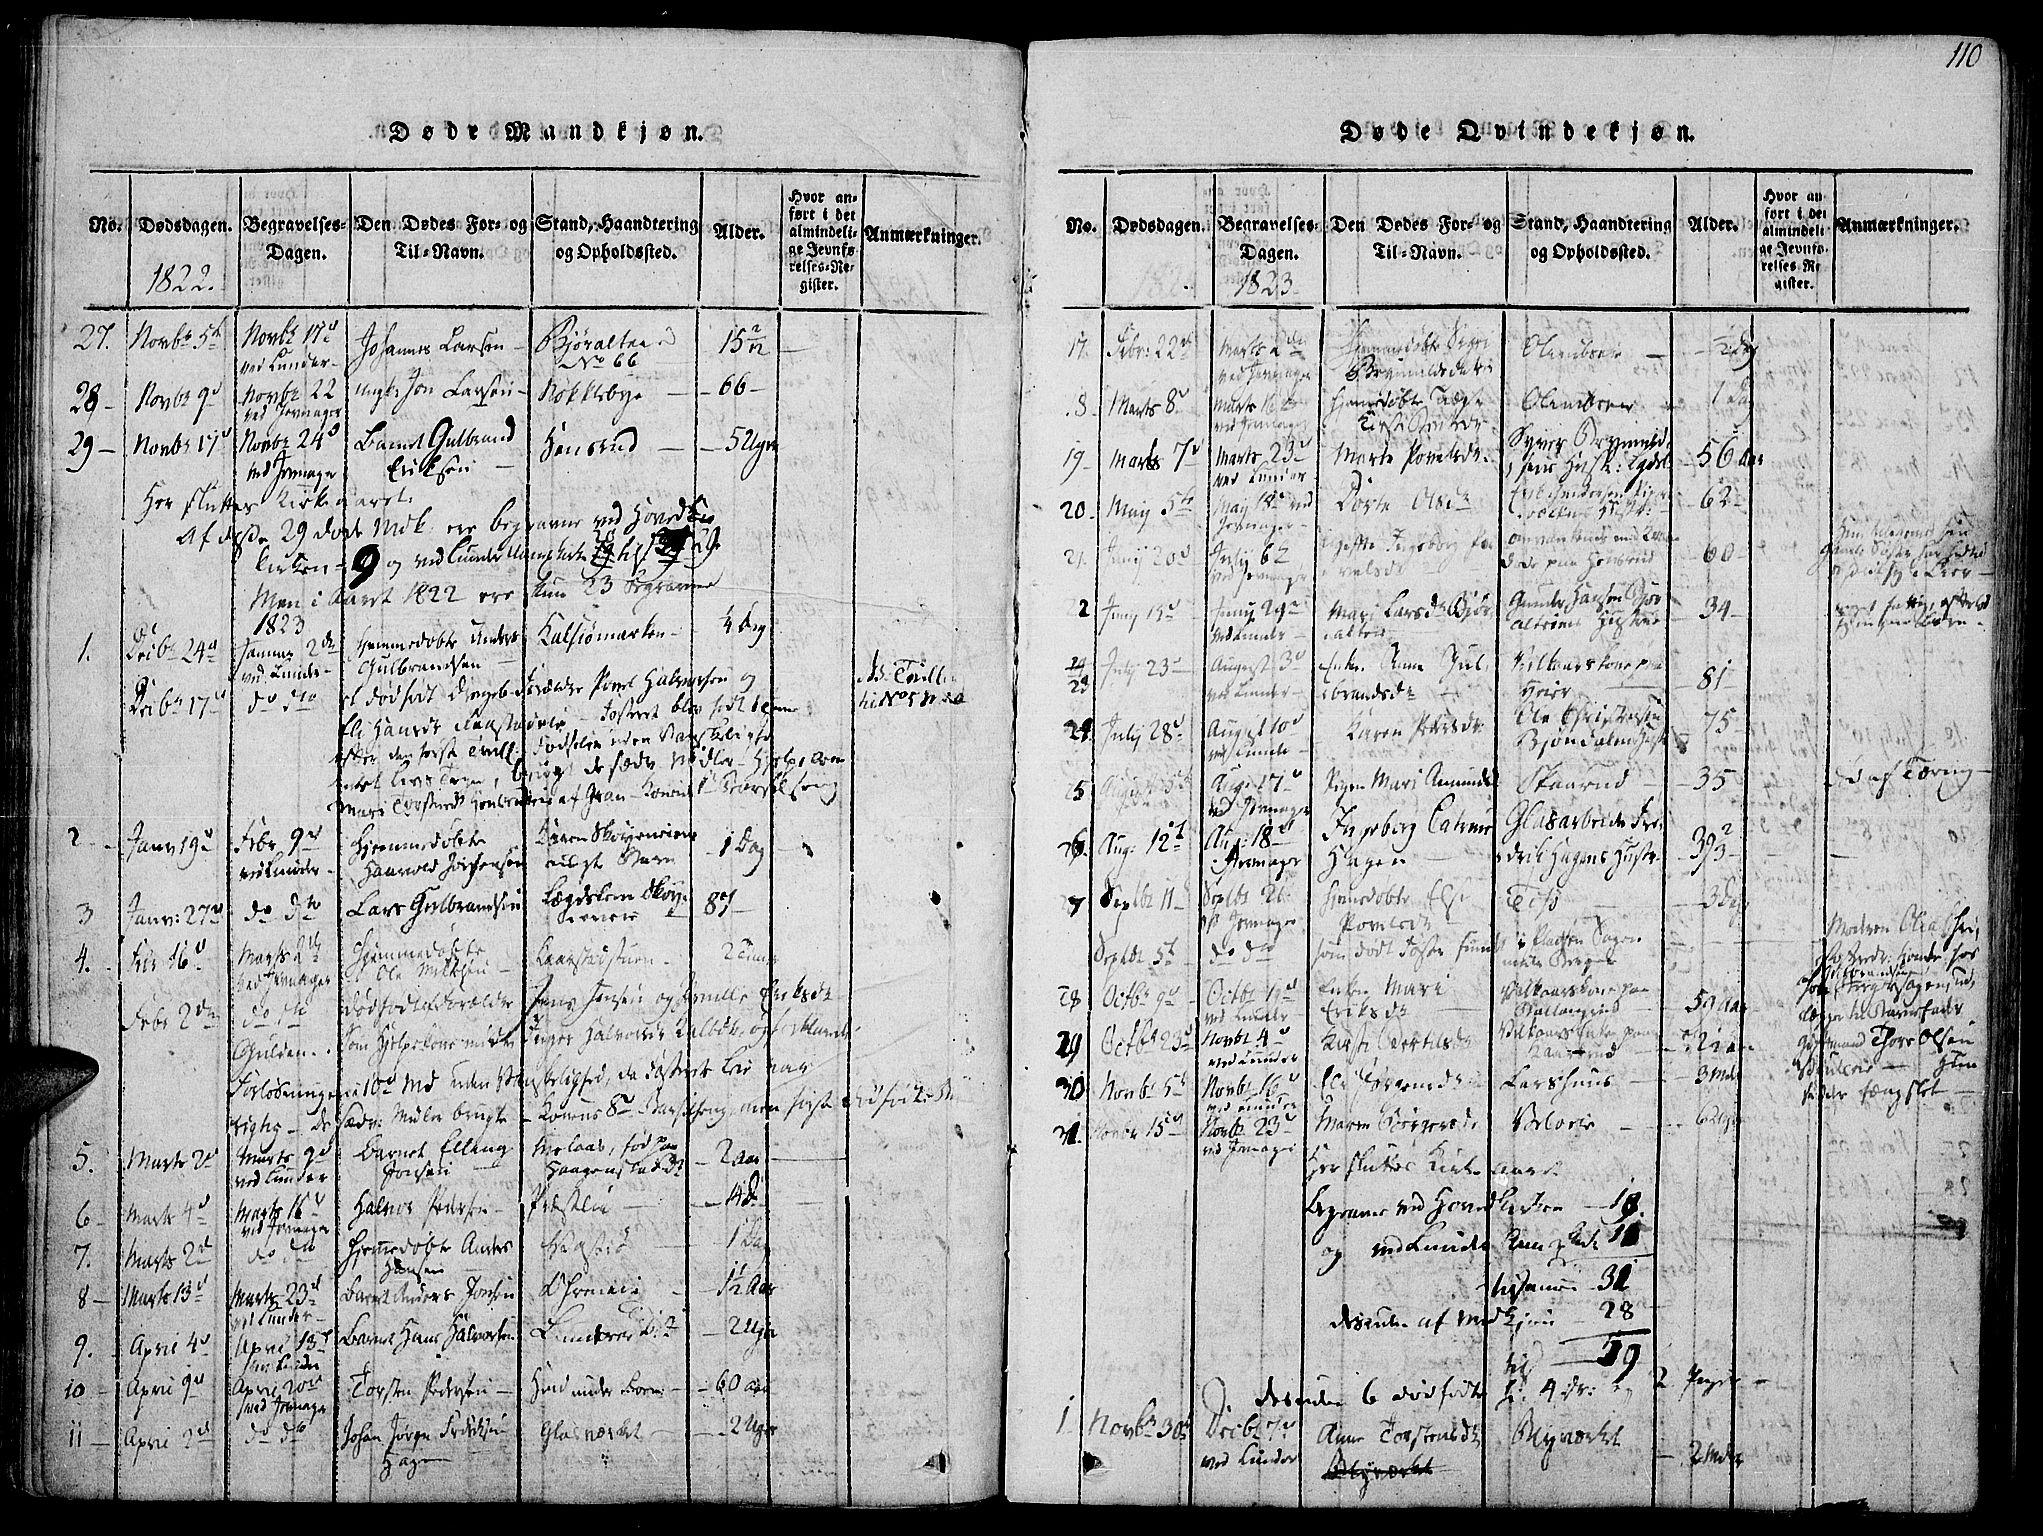 SAH, Jevnaker prestekontor, Ministerialbok nr. 5, 1815-1837, s. 110